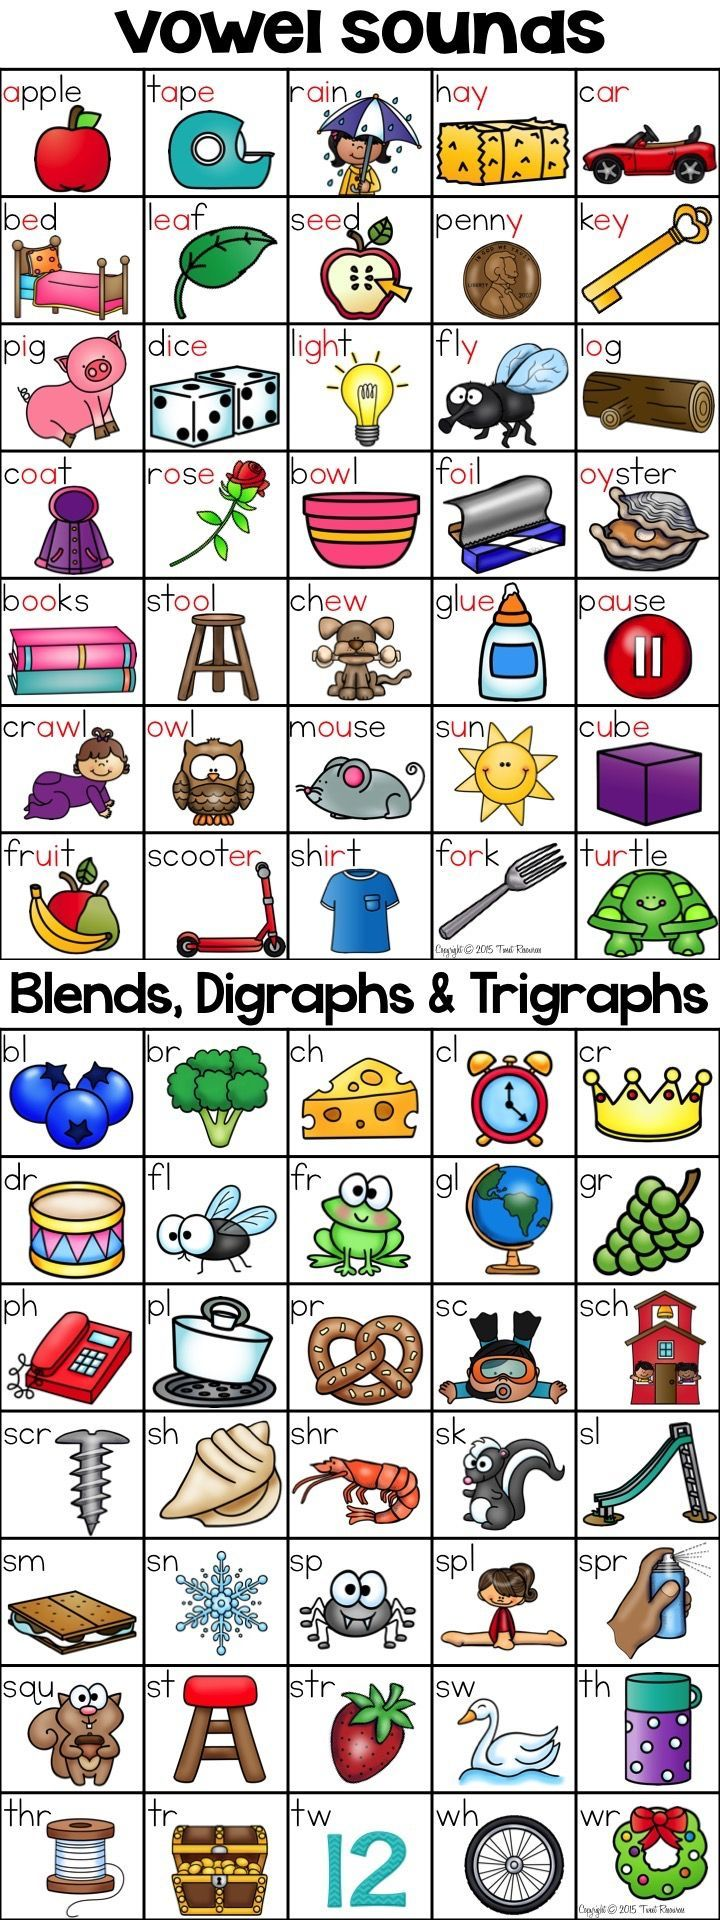 Alphabet, vowel sounds, blends, digraphs, trigraphs charts